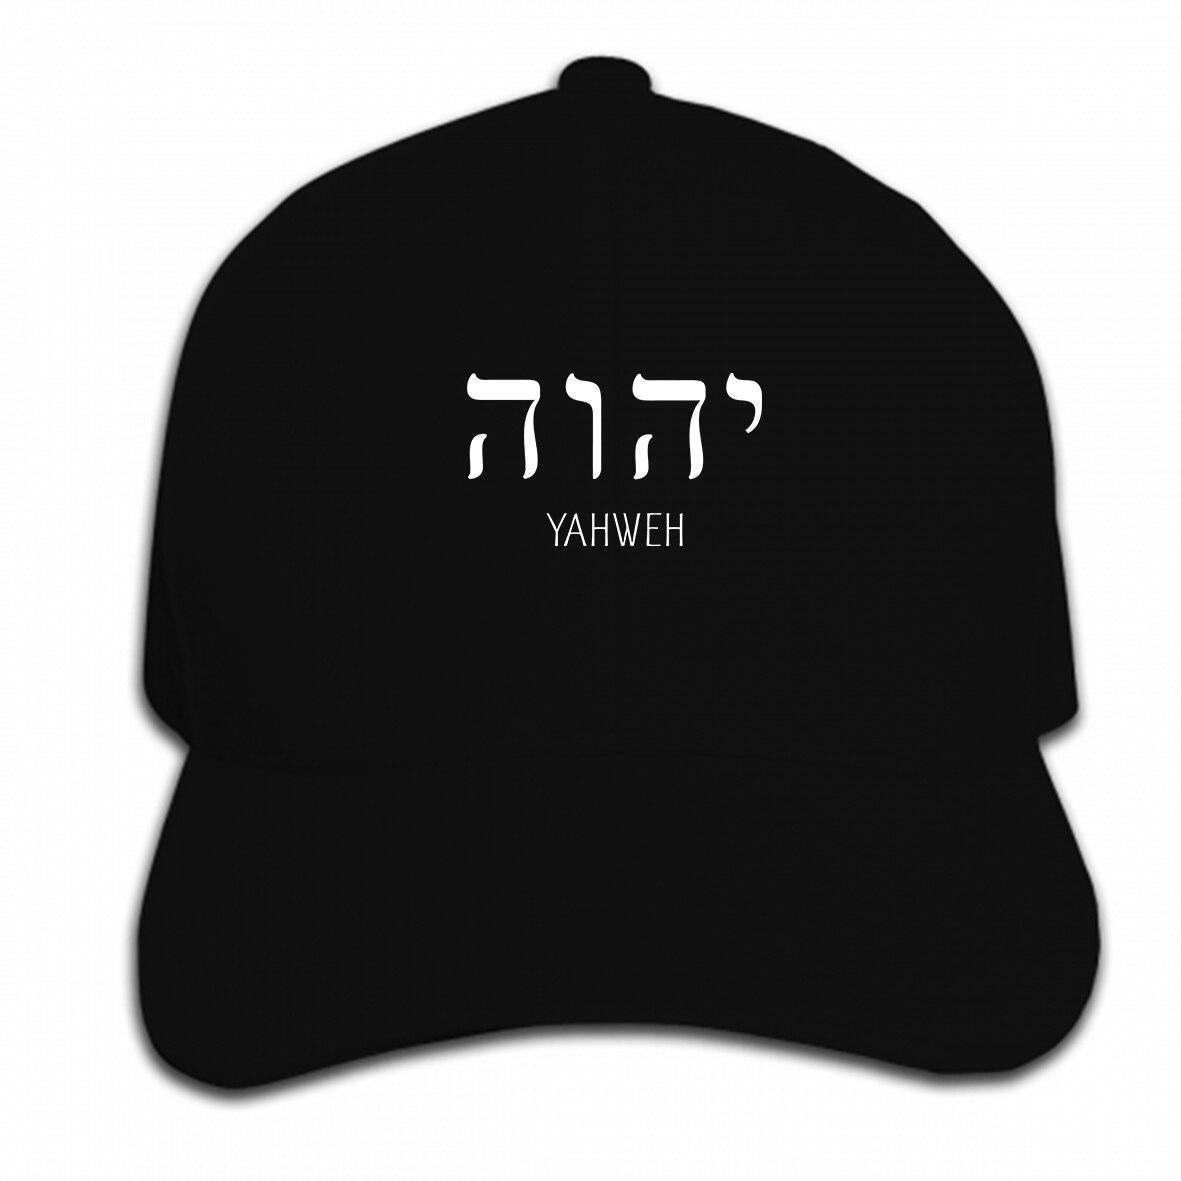 Бейсбольная кепка с принтом на заказ Yahweh Yhwh всемогущая мужская повседневная Кепка с принтом